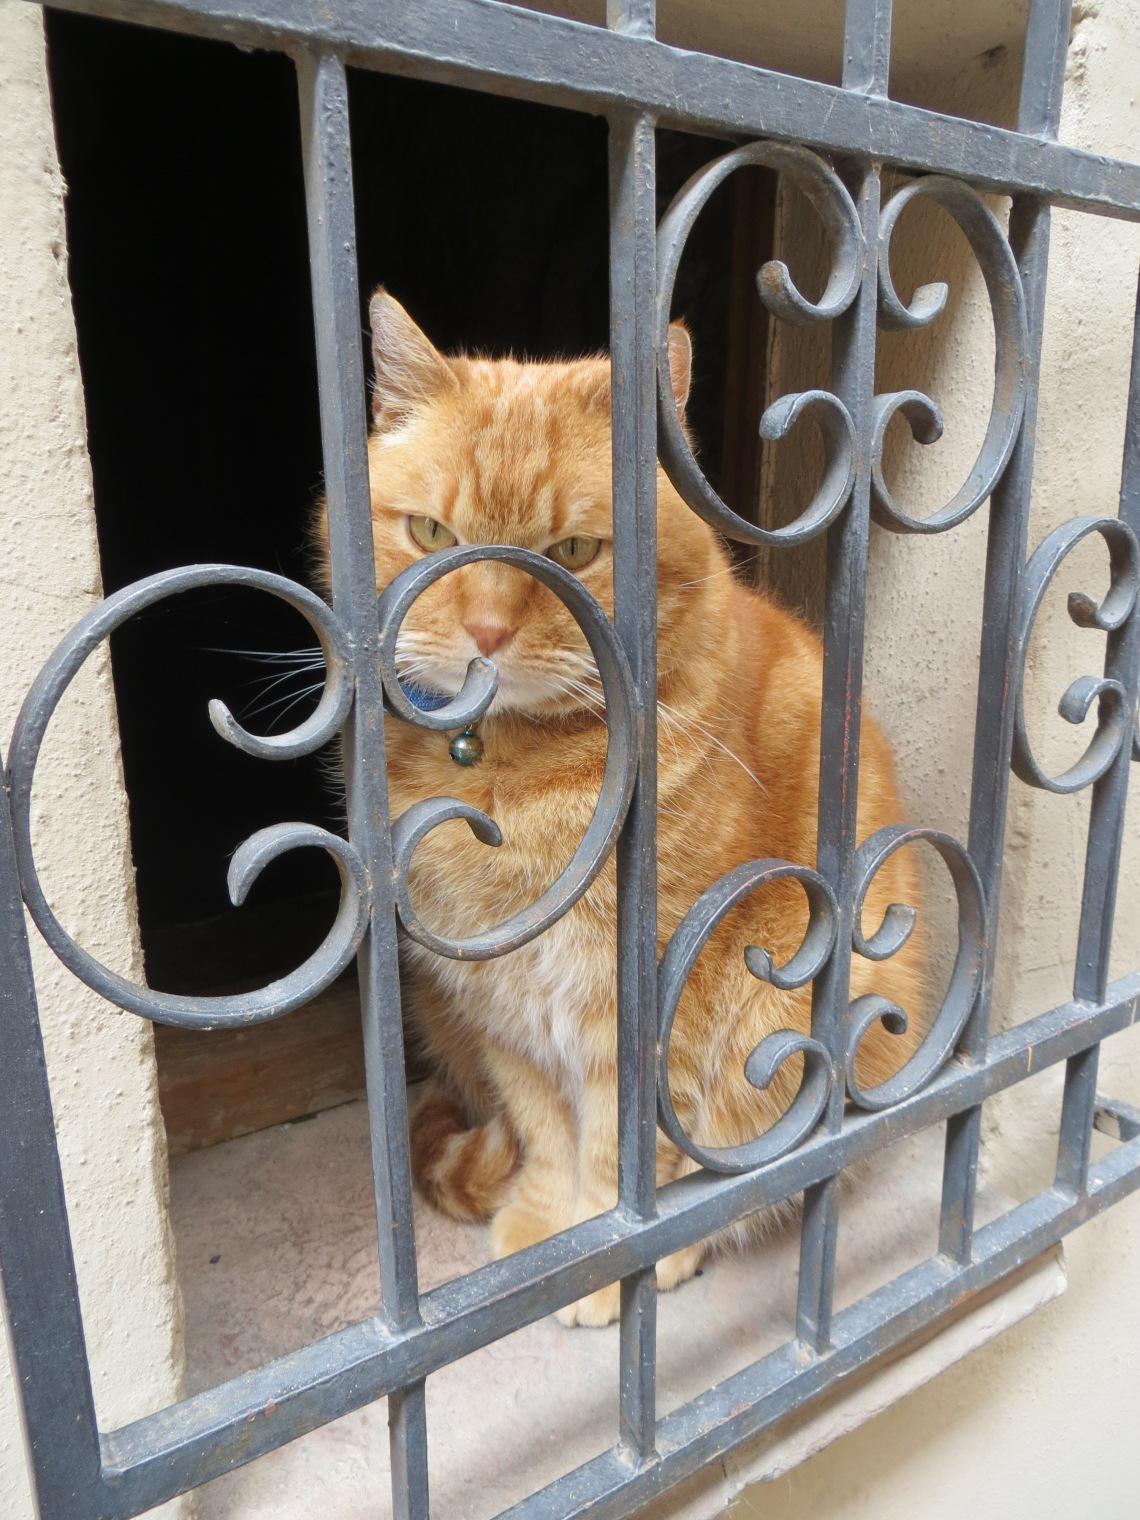 Montepulciano cat, Italy